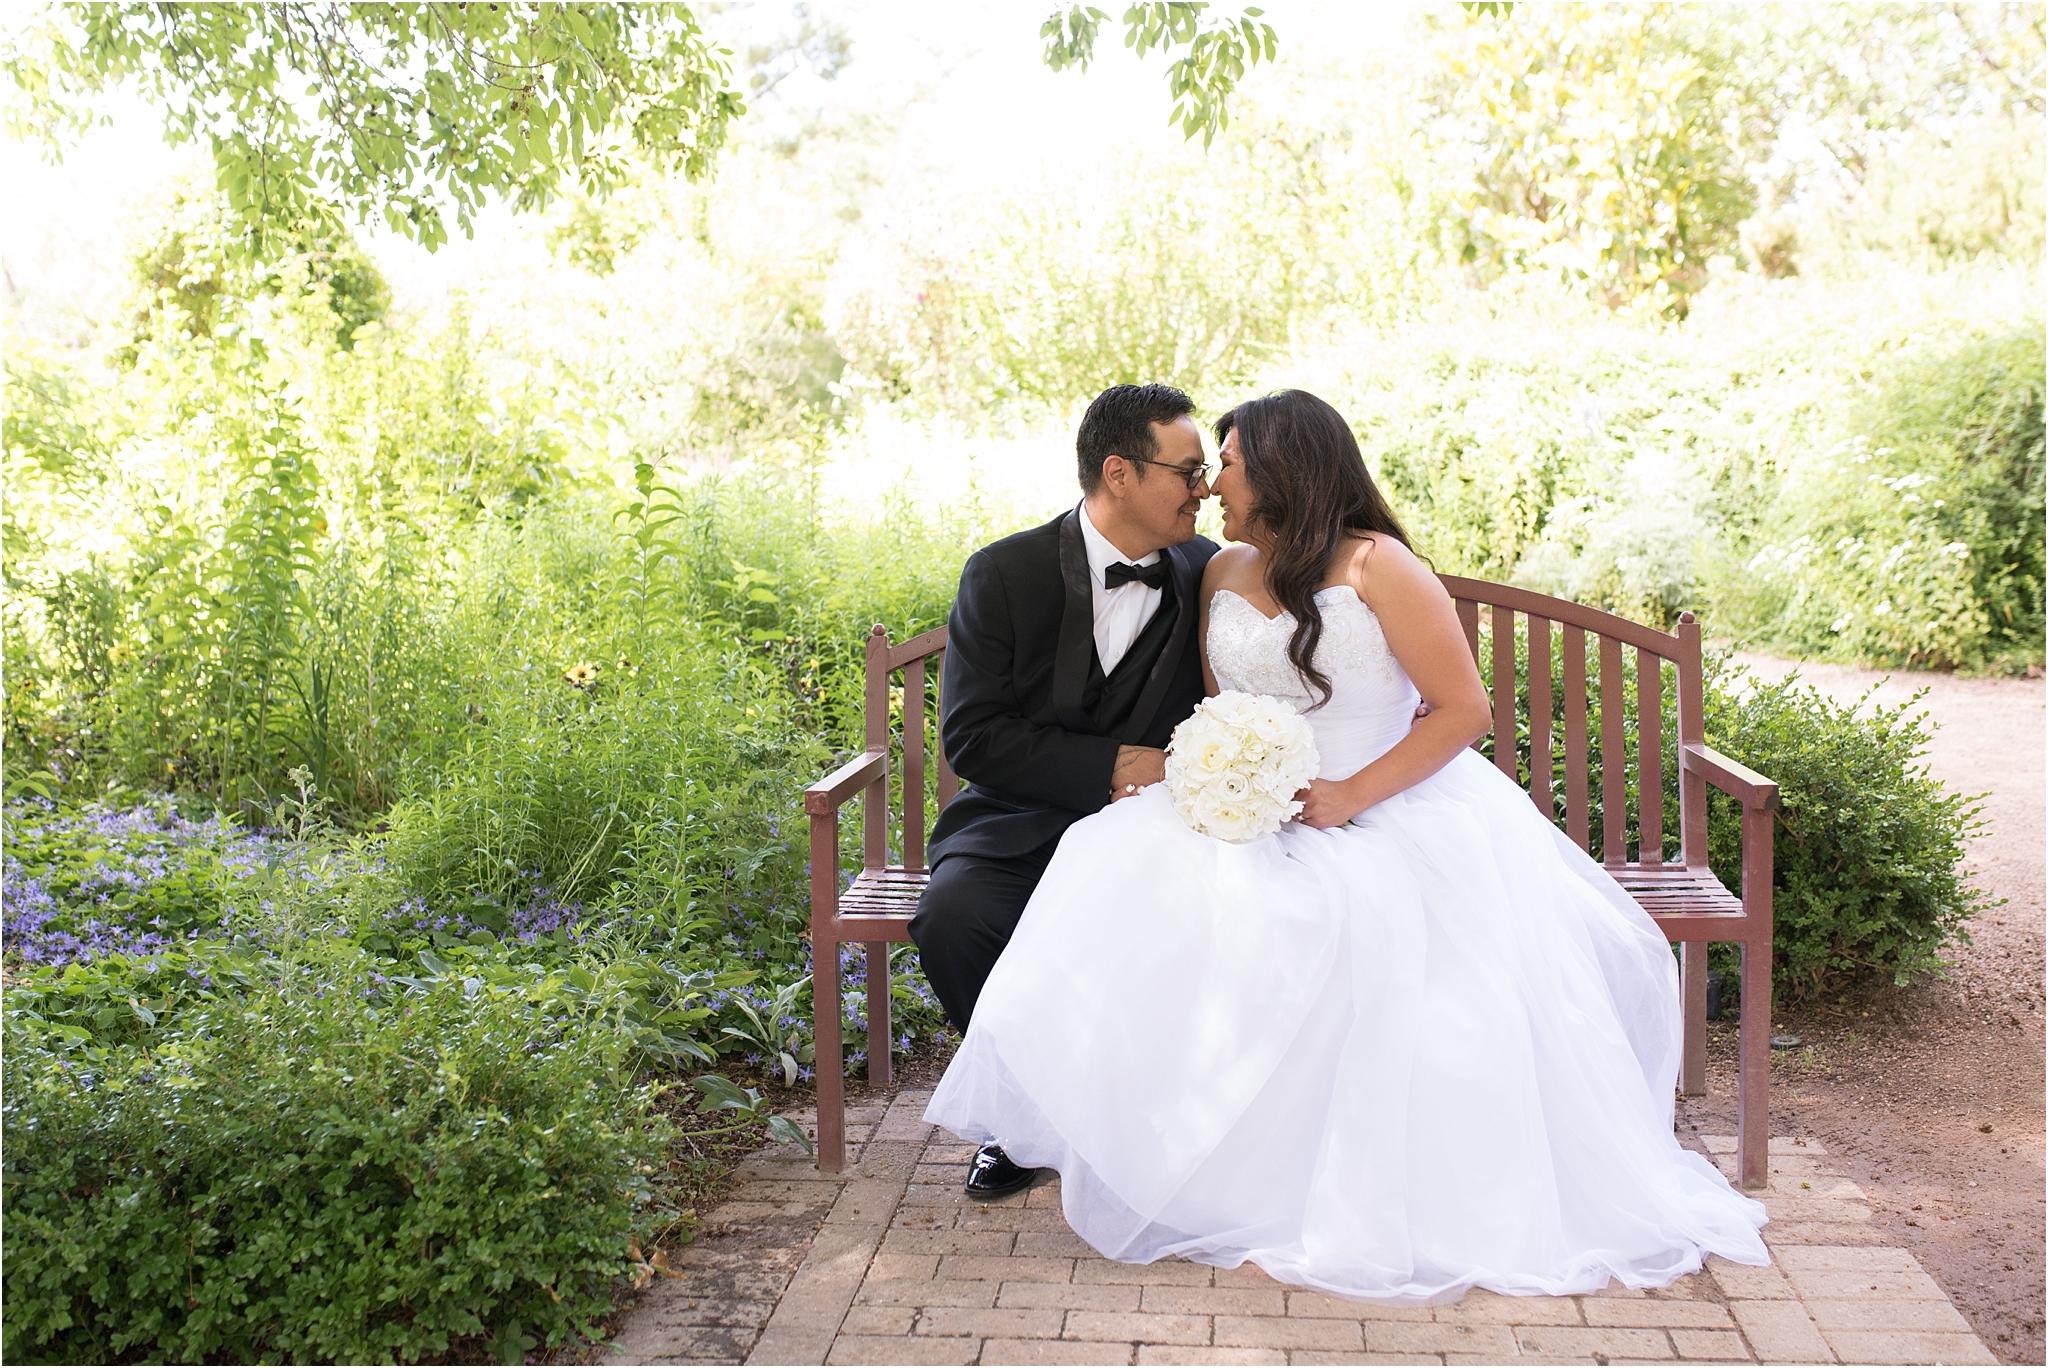 kayla kitts photography - albuquerque botanical gardens - albuquerque wedding photographer - albuquerque wedding - the banque lofts wedding_0009.jpg